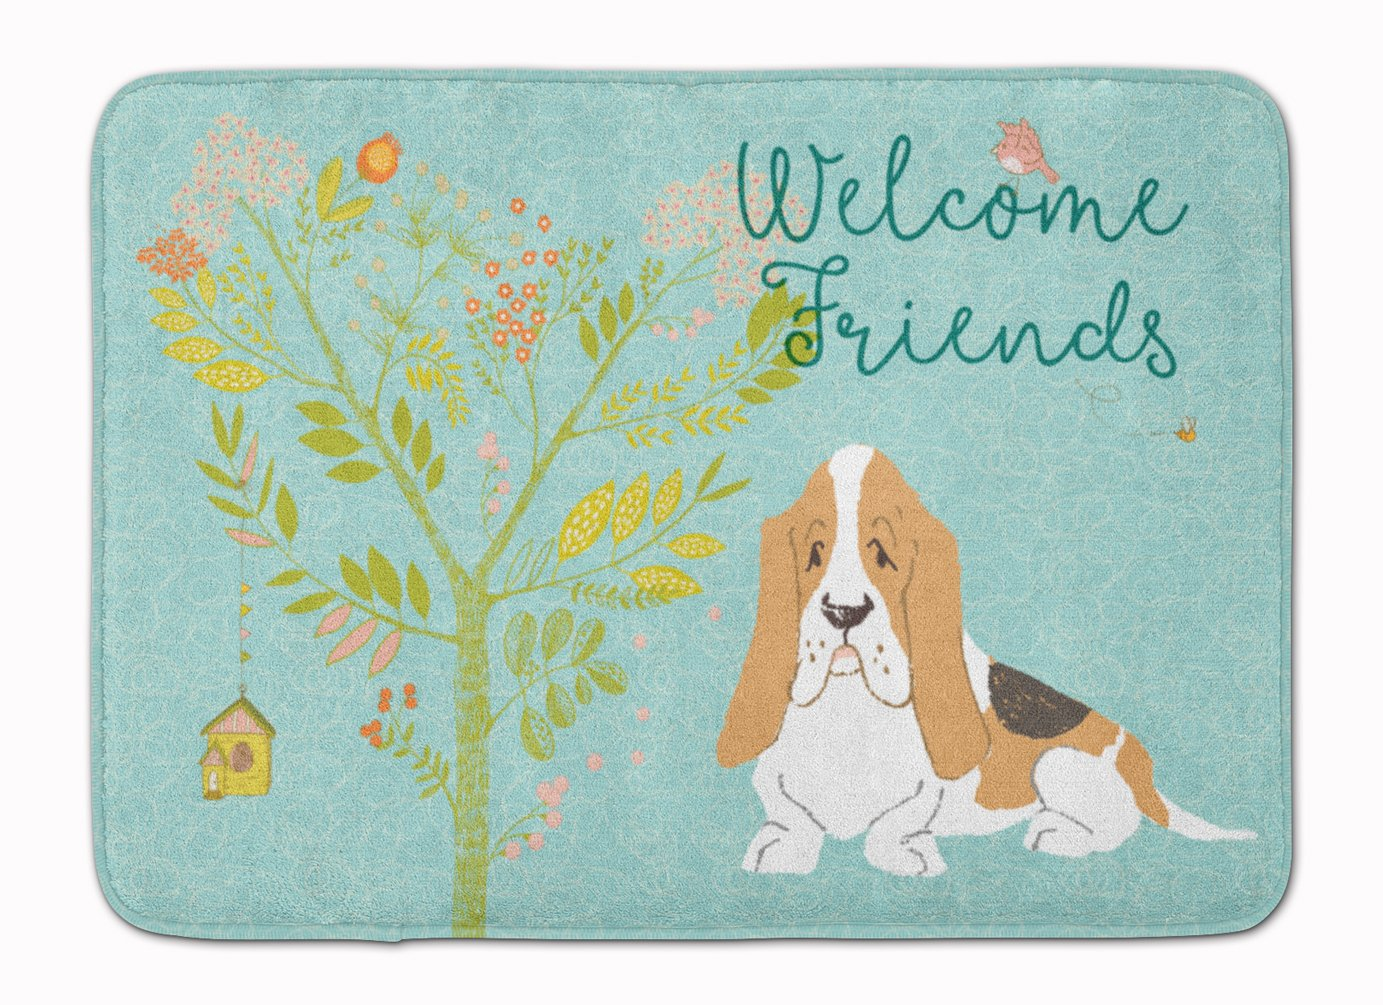 Carolines Treasures Welcome Friends Basset Hound Floor Mat 19hx27w Multicolor